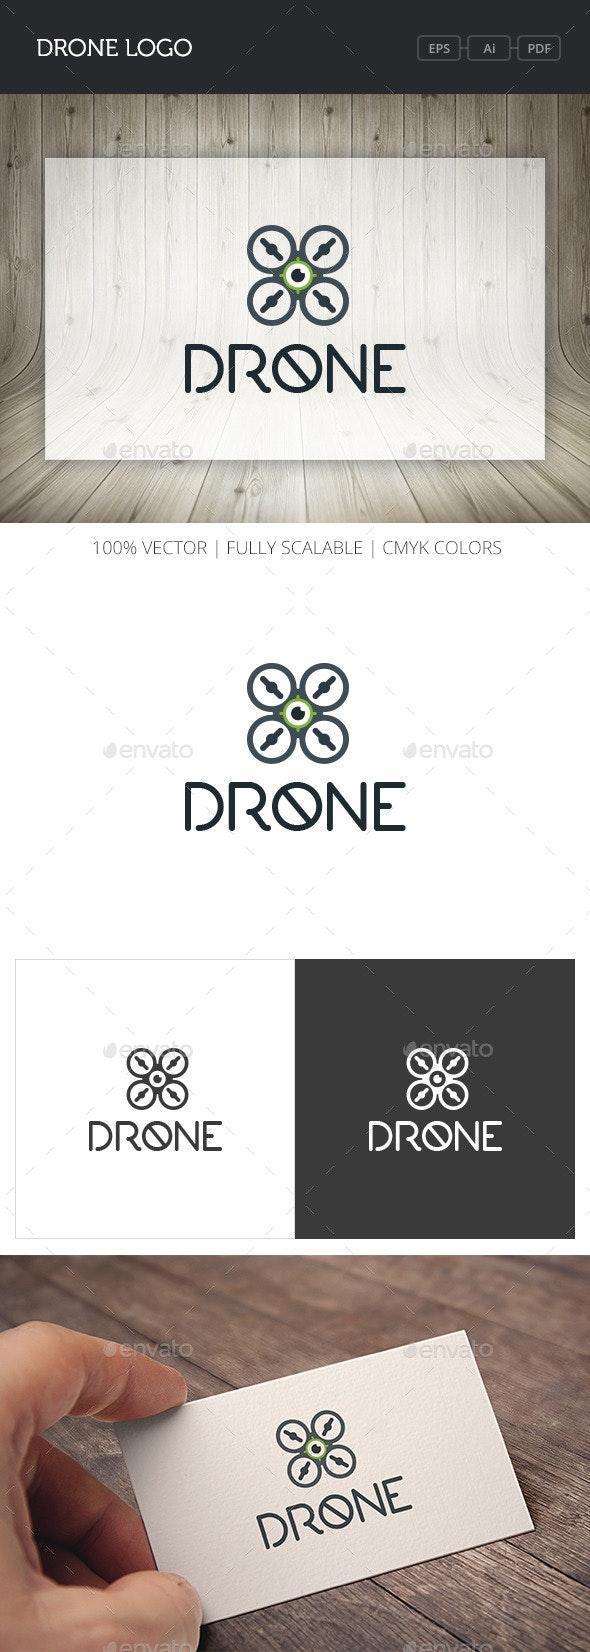 Drone Logo - Objects Logo Templates